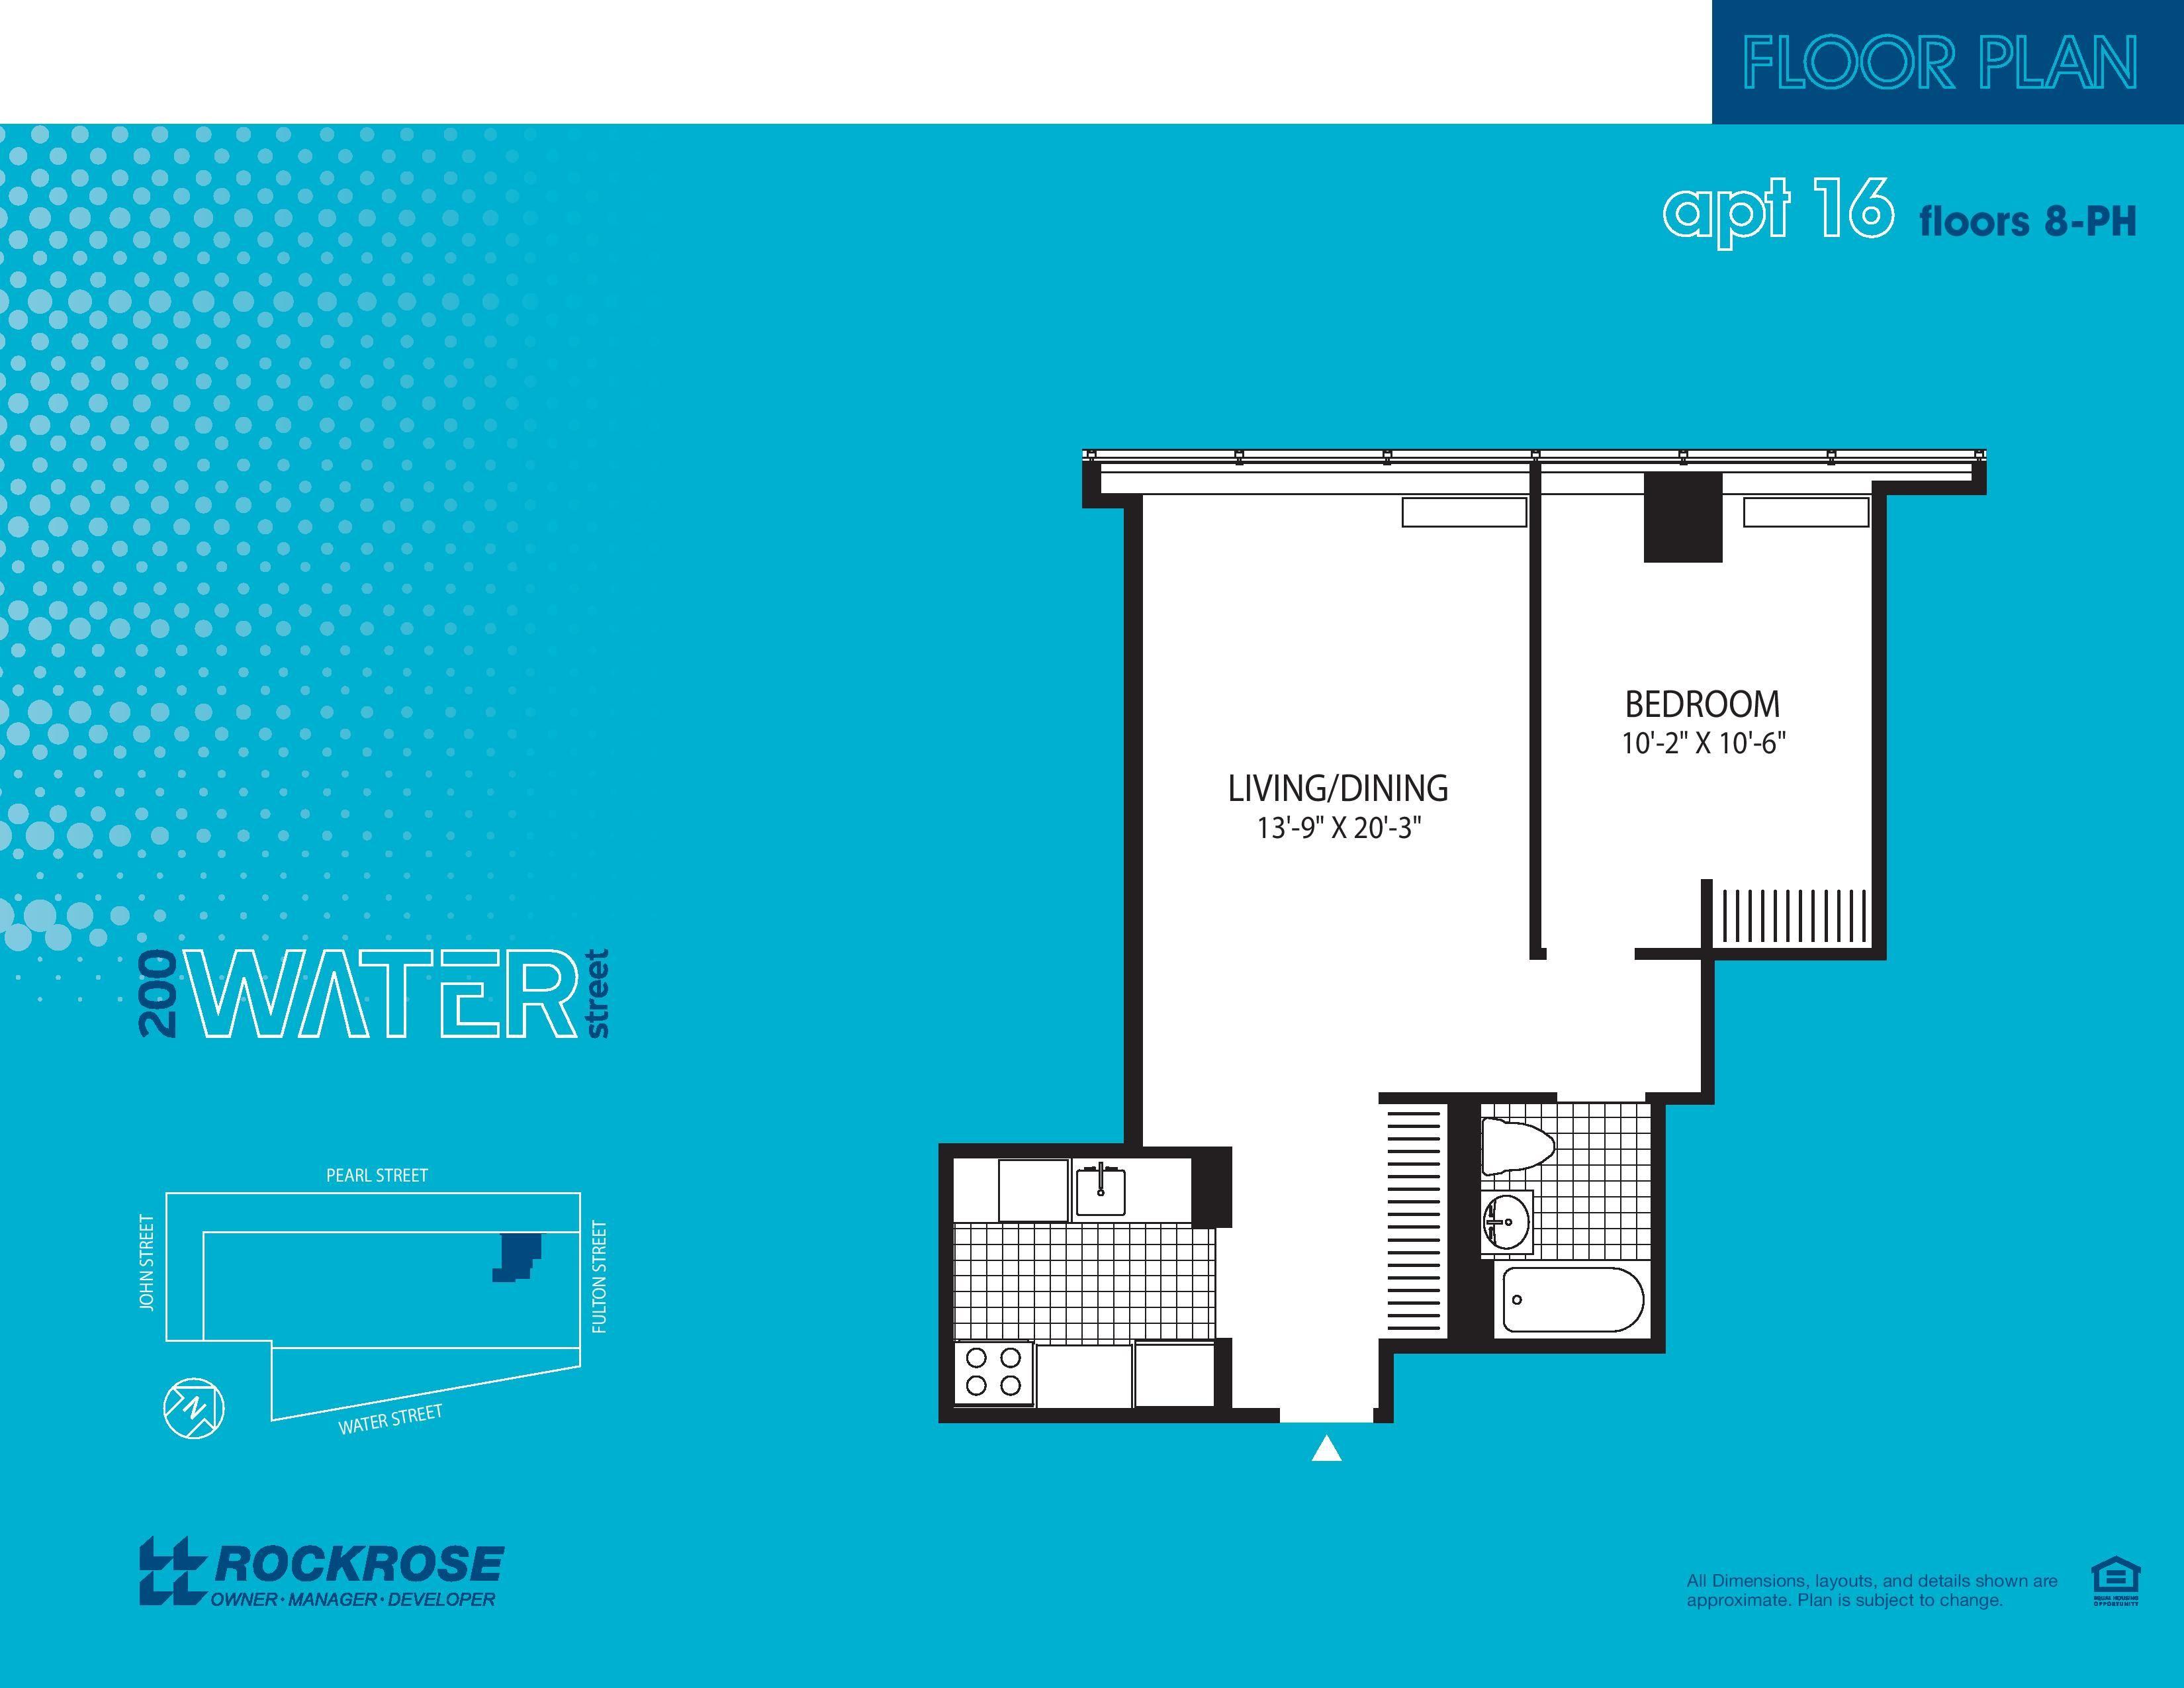 200 Water Street Apartment Floor Plans - New York NY   New York City ...